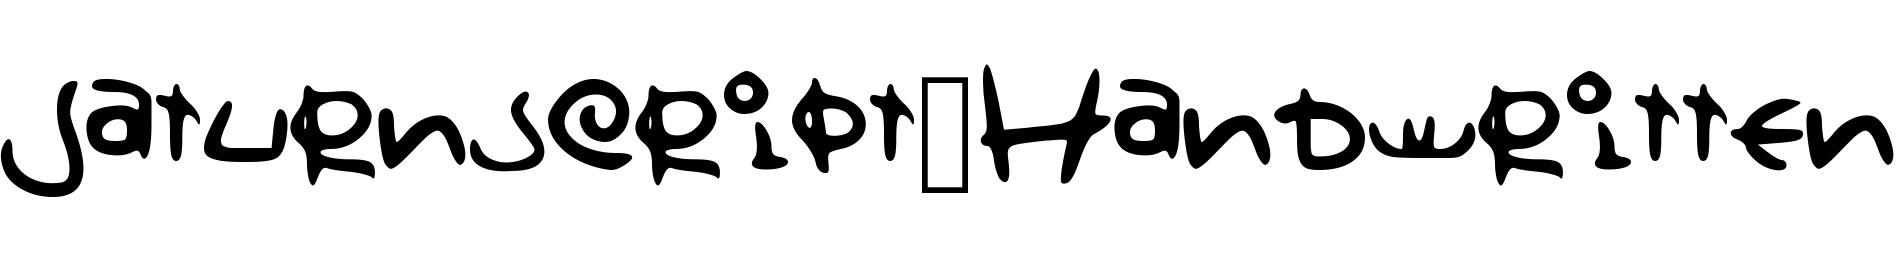 Saturnscript_Handwritten